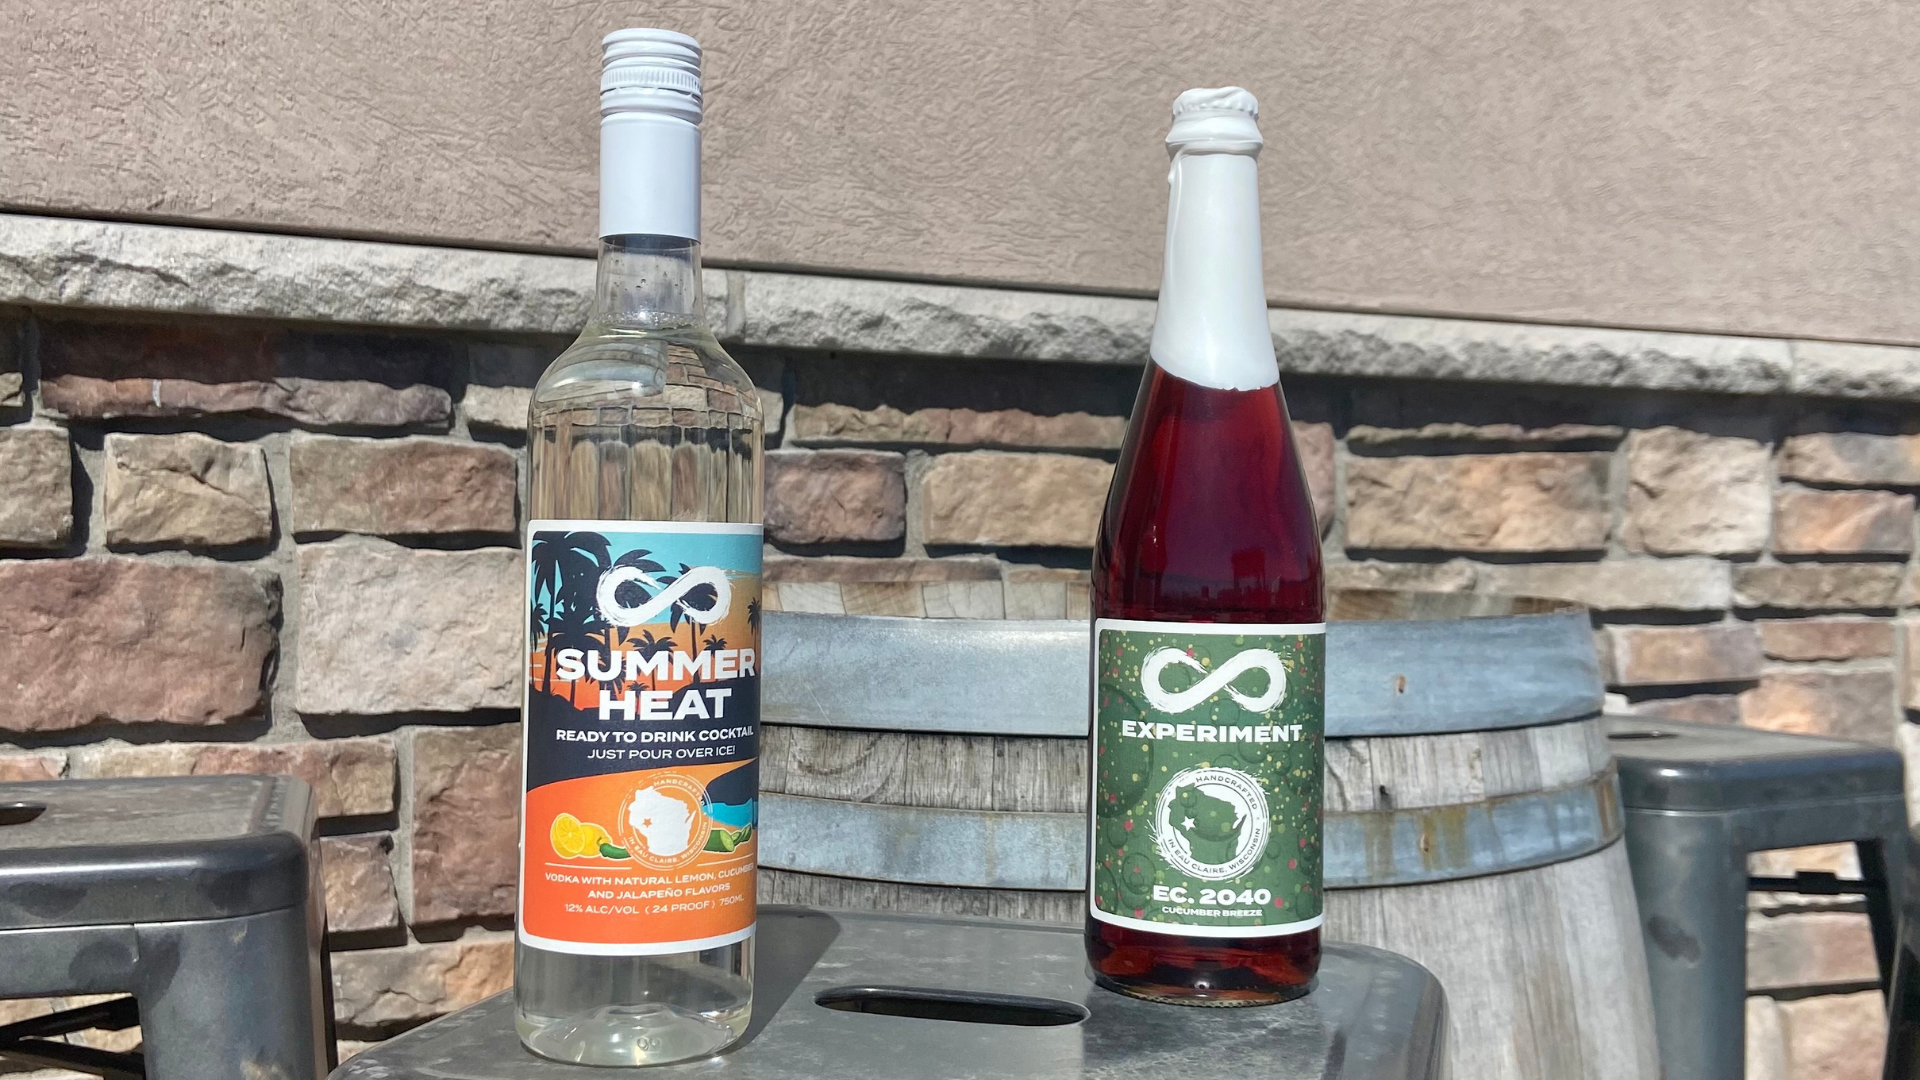 Cucumber Breeze & Summer Heat Ready to Drink Release